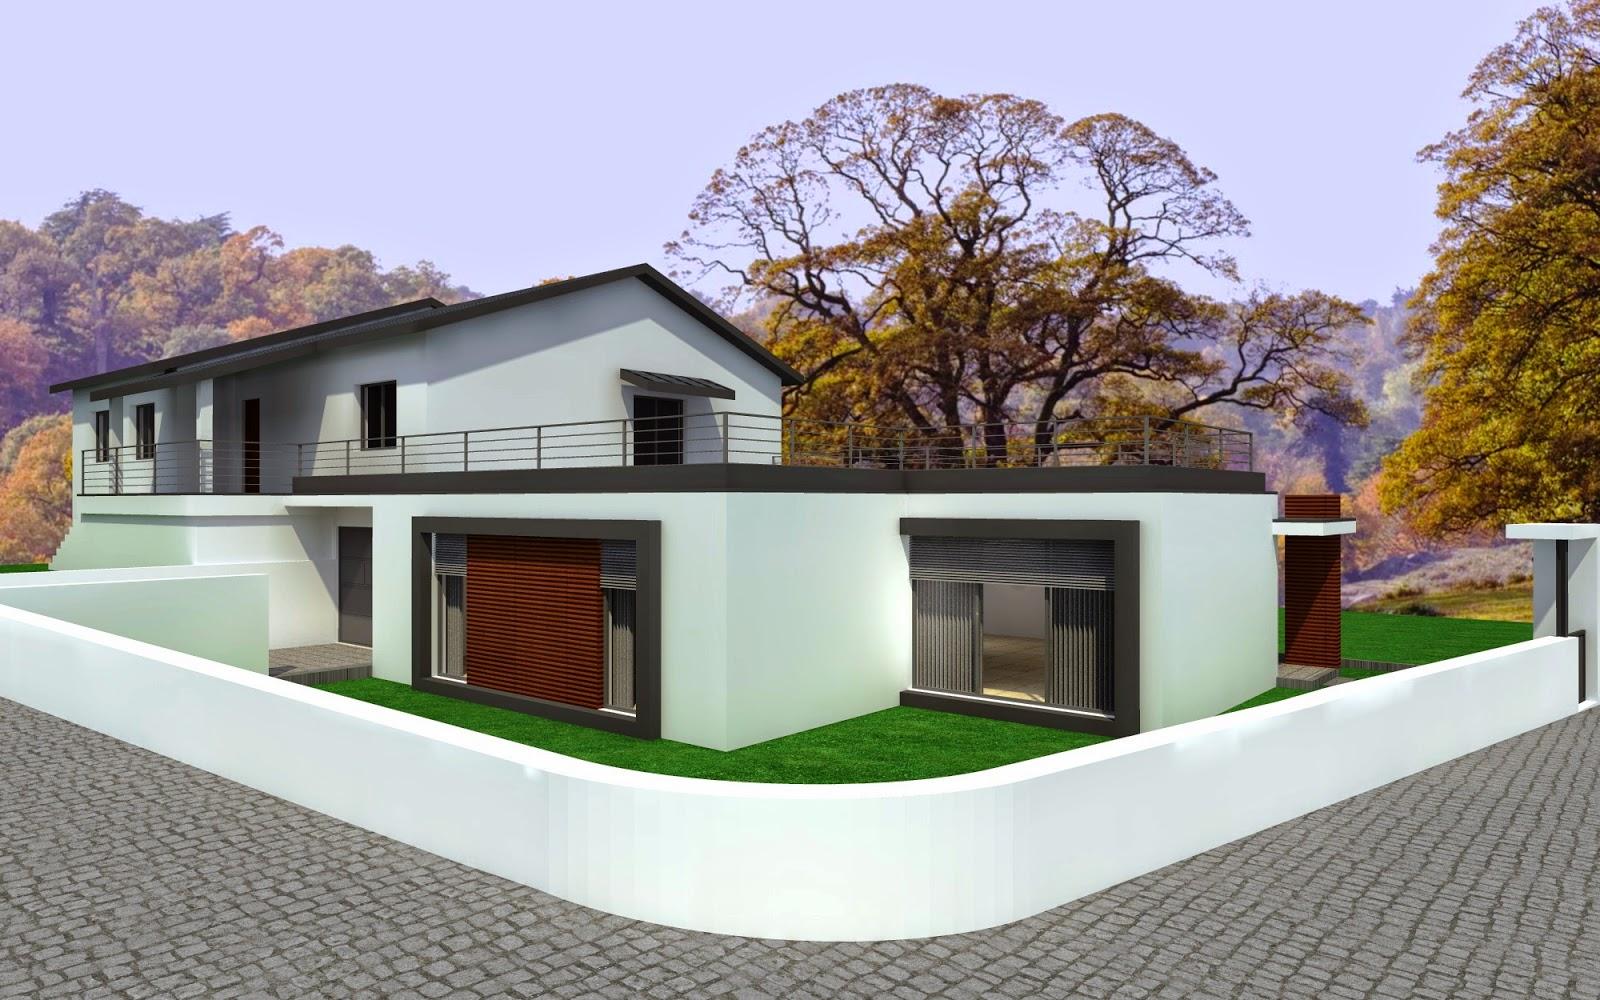 Casas modulares steel houses maio 2014 for Casas modulares minimalistas